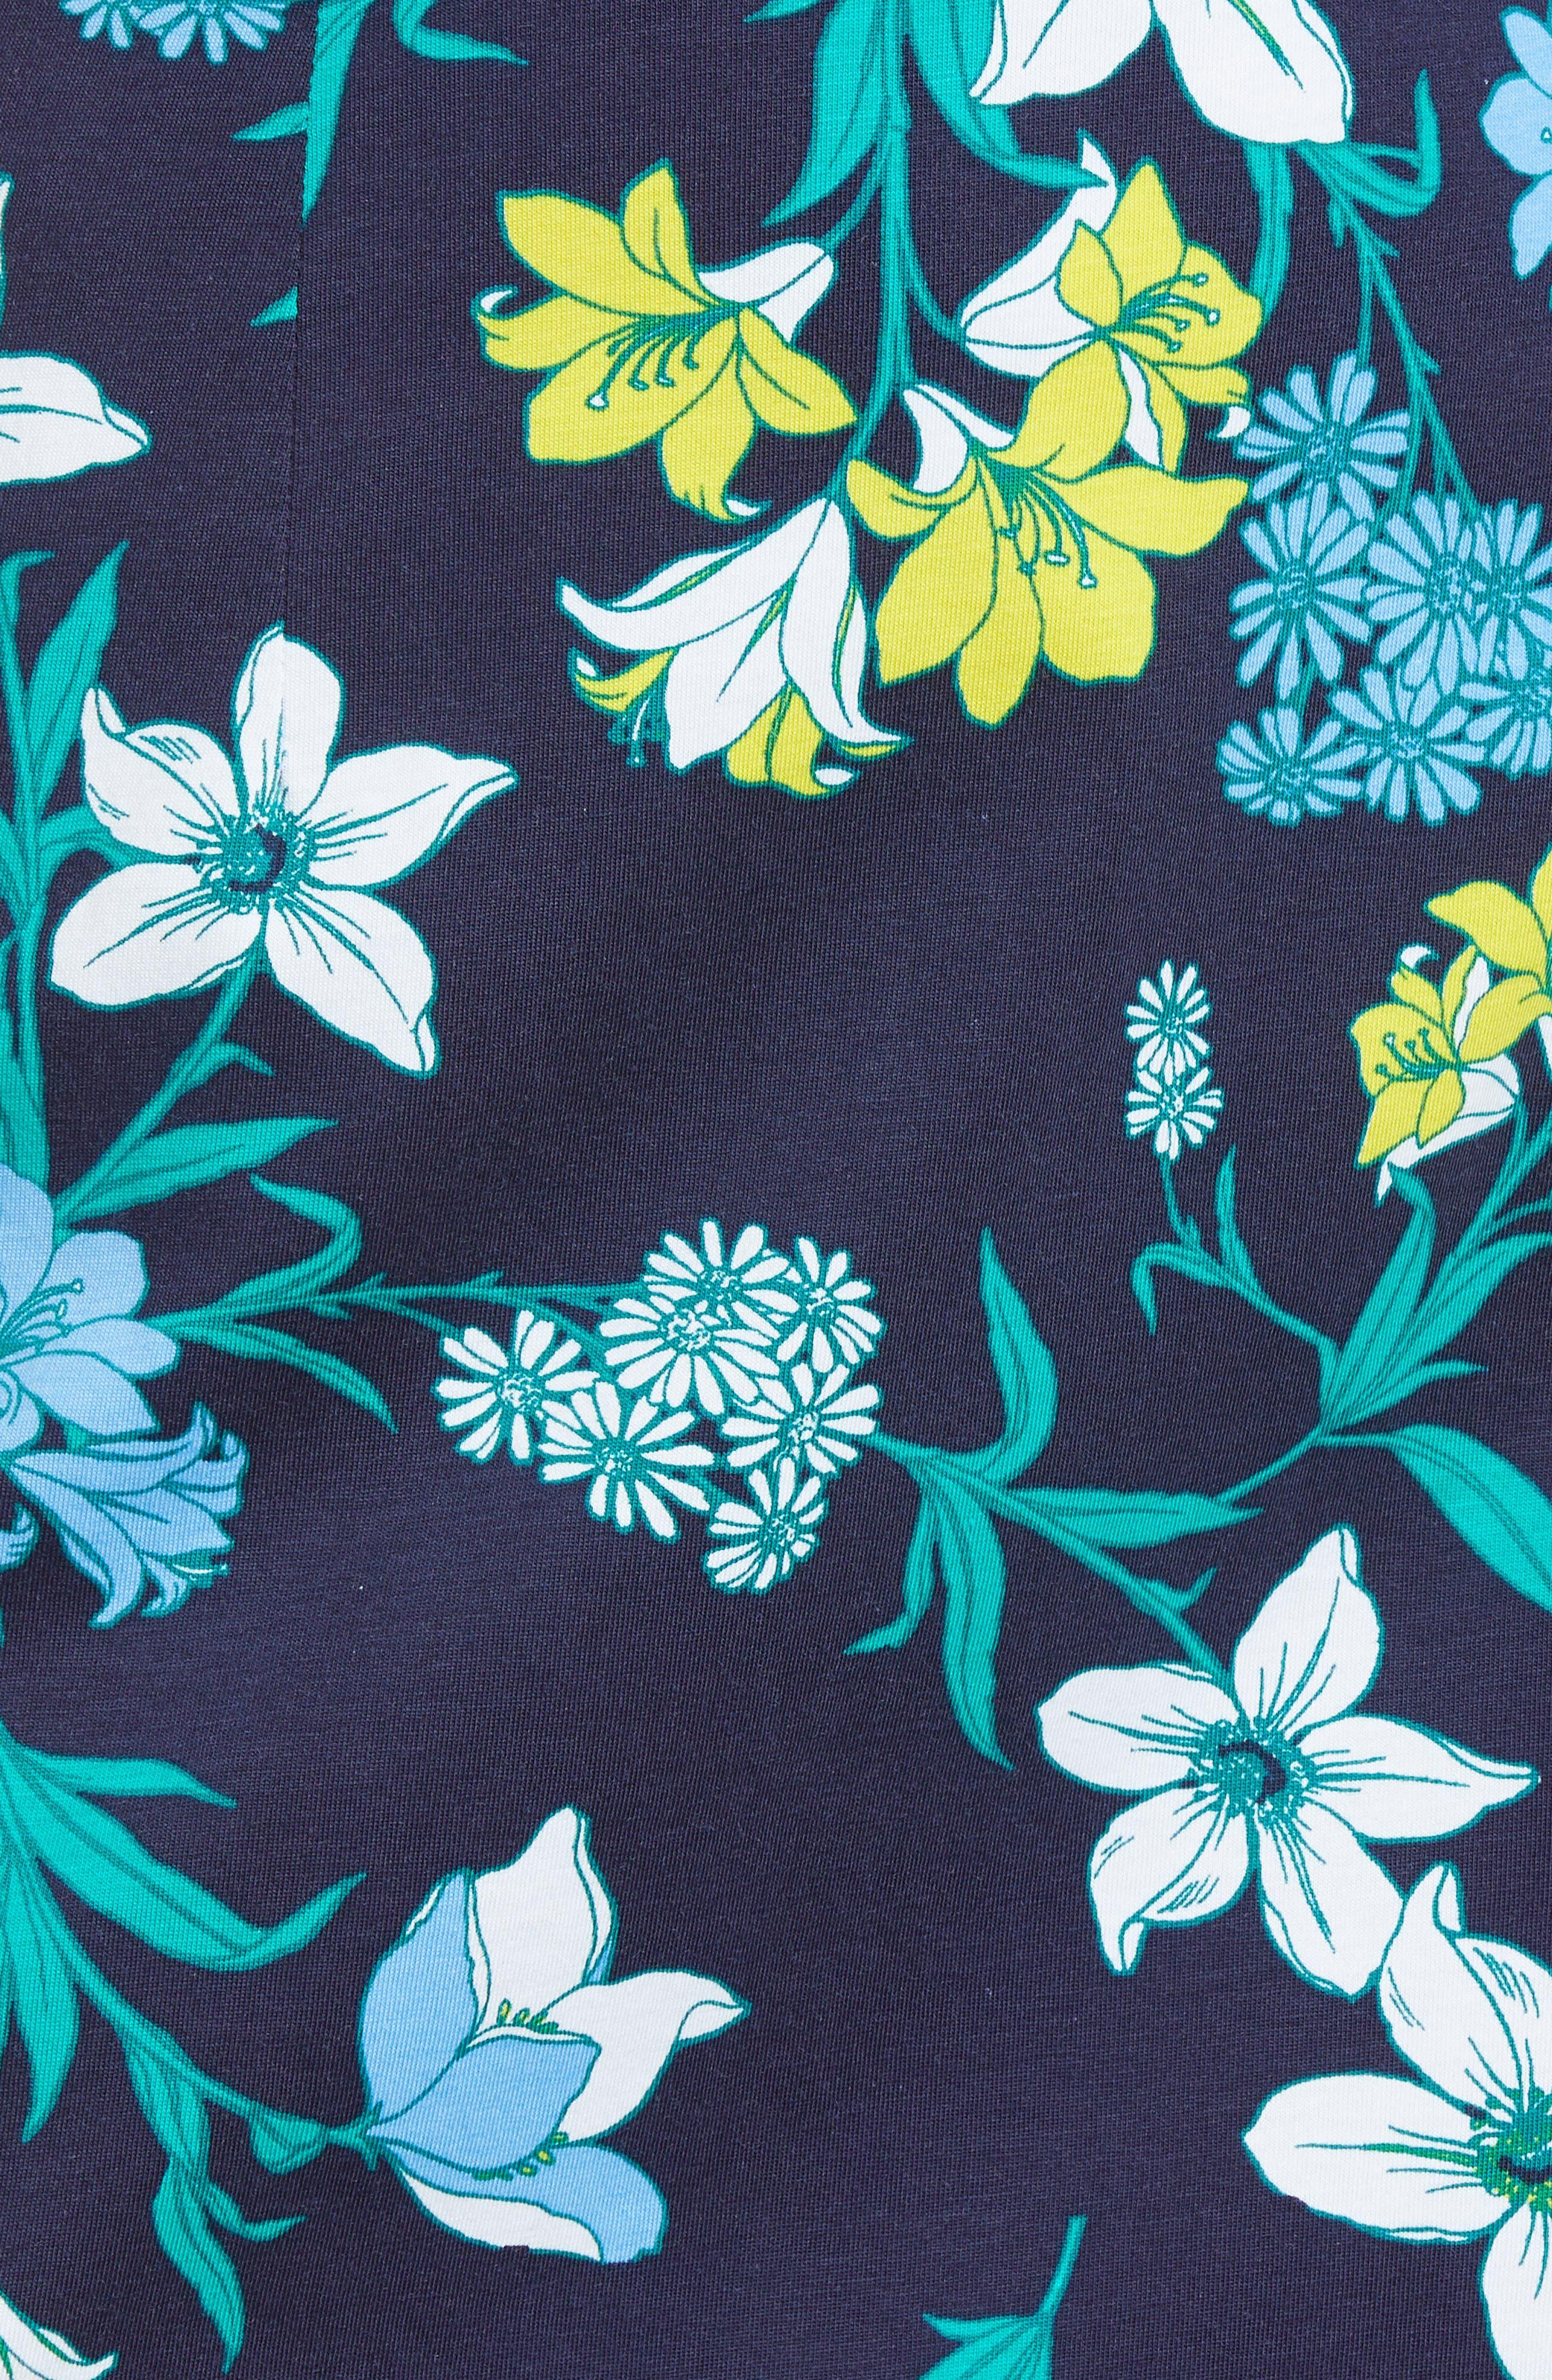 Floral Ruffle Cotton Dress,                             Alternate thumbnail 5, color,